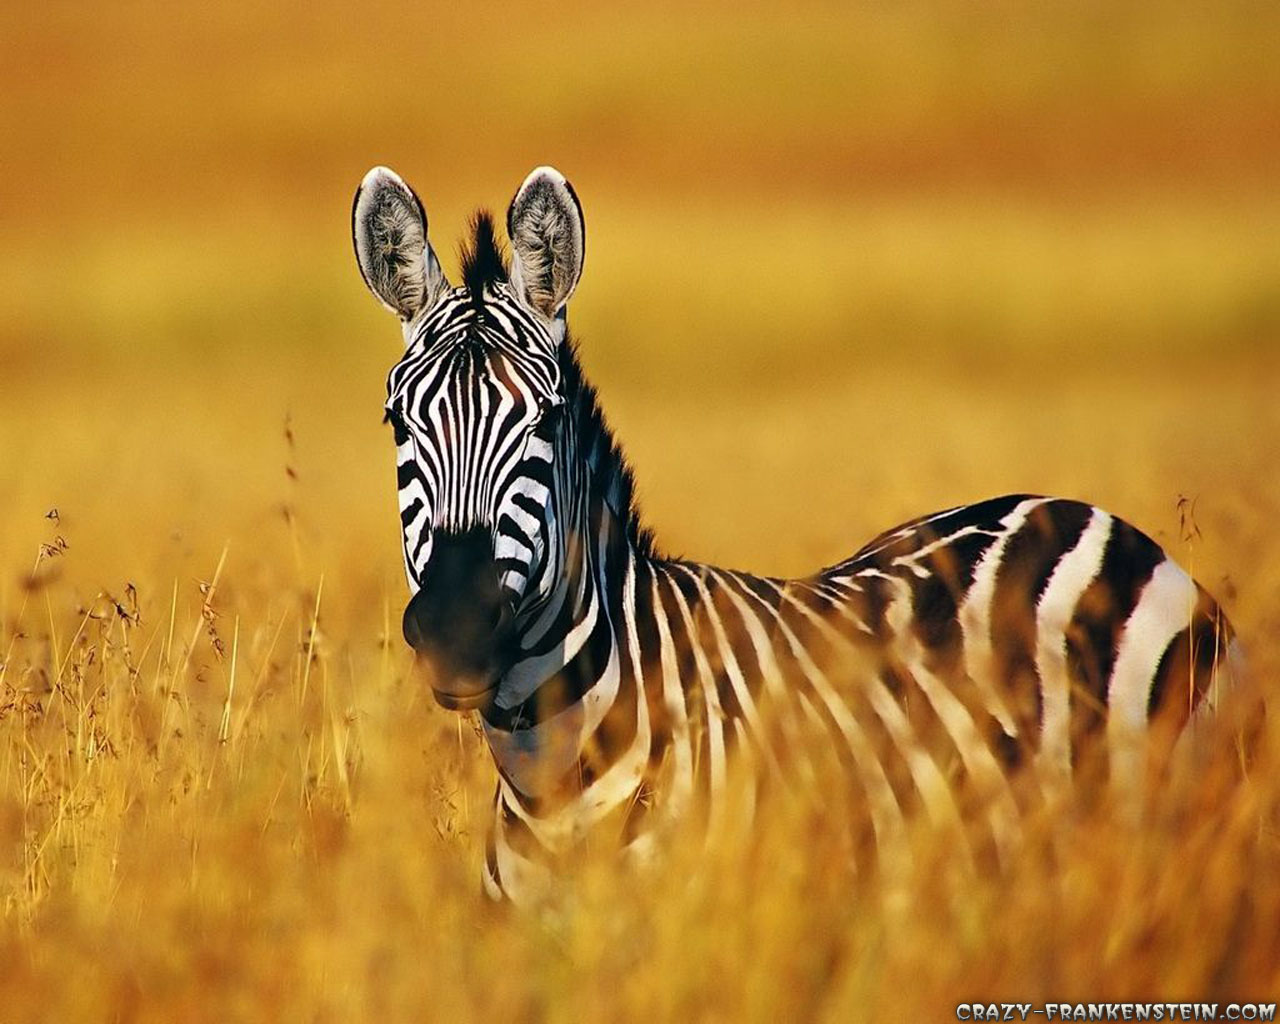 http://1.bp.blogspot.com/-4jecMNlX8As/ThlgMJ2NyyI/AAAAAAAALrE/idJXQuTAz5s/s1600/zebra-animal-wallpapers-1280x1024.jpg